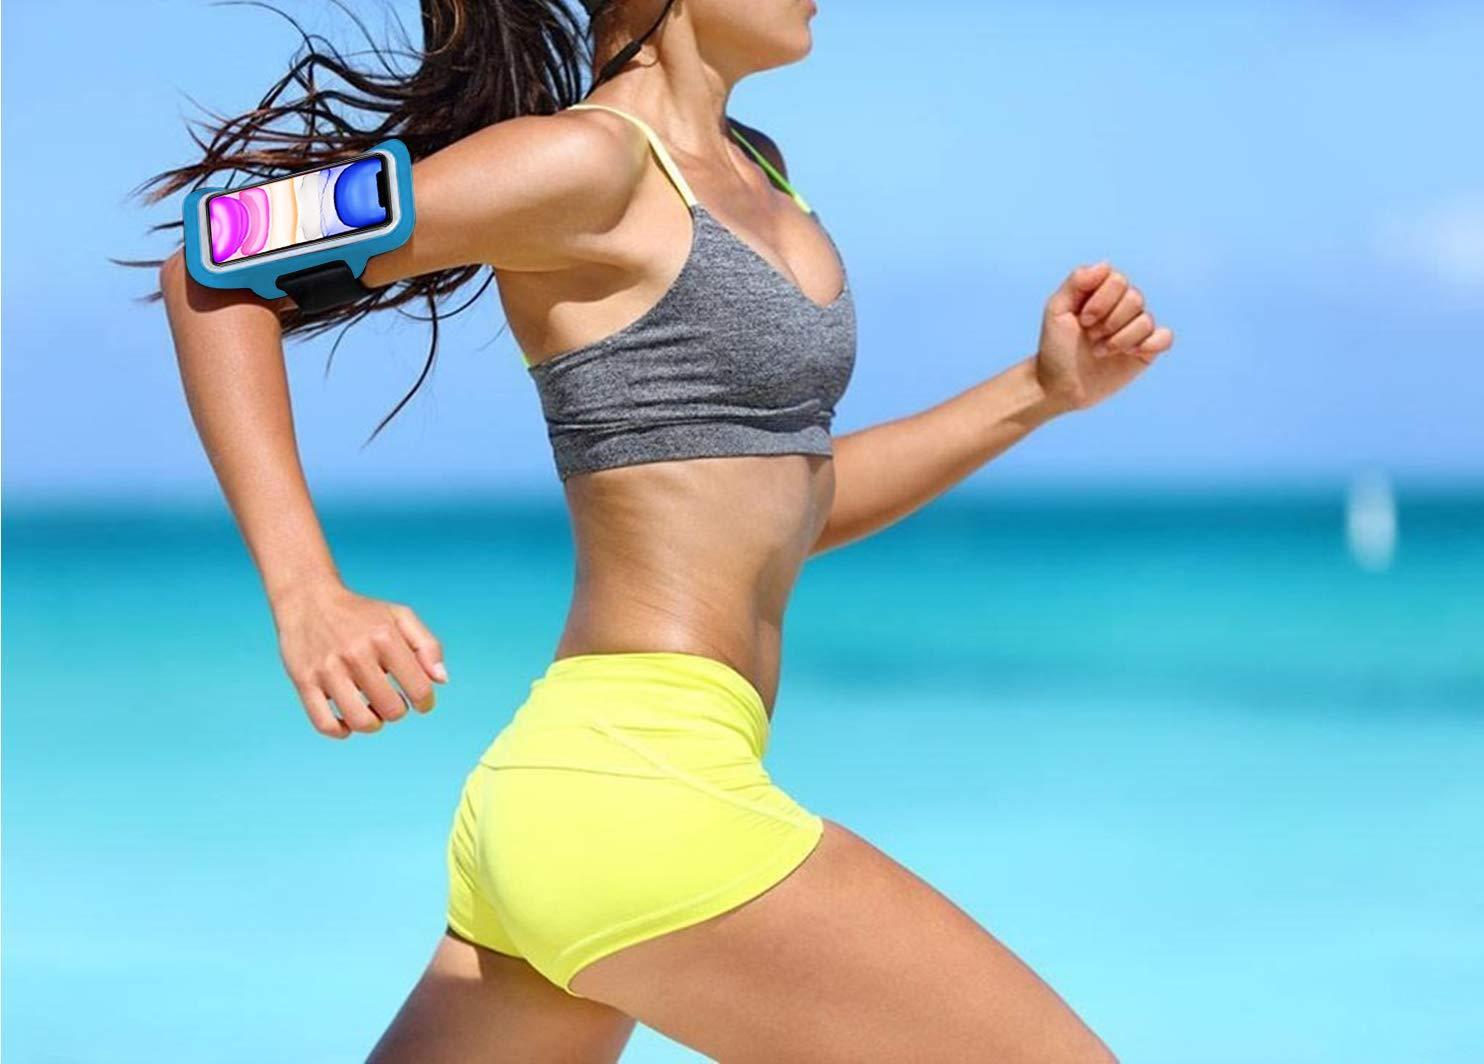 Azul Brazalete Deportivo para Correr Running valido Smartphones hasta 6.8 Neopreno Ajustable Velcro antisudor Antideslizante Brazalete movil Funda movil Bolsillo para Auriculares Llaves